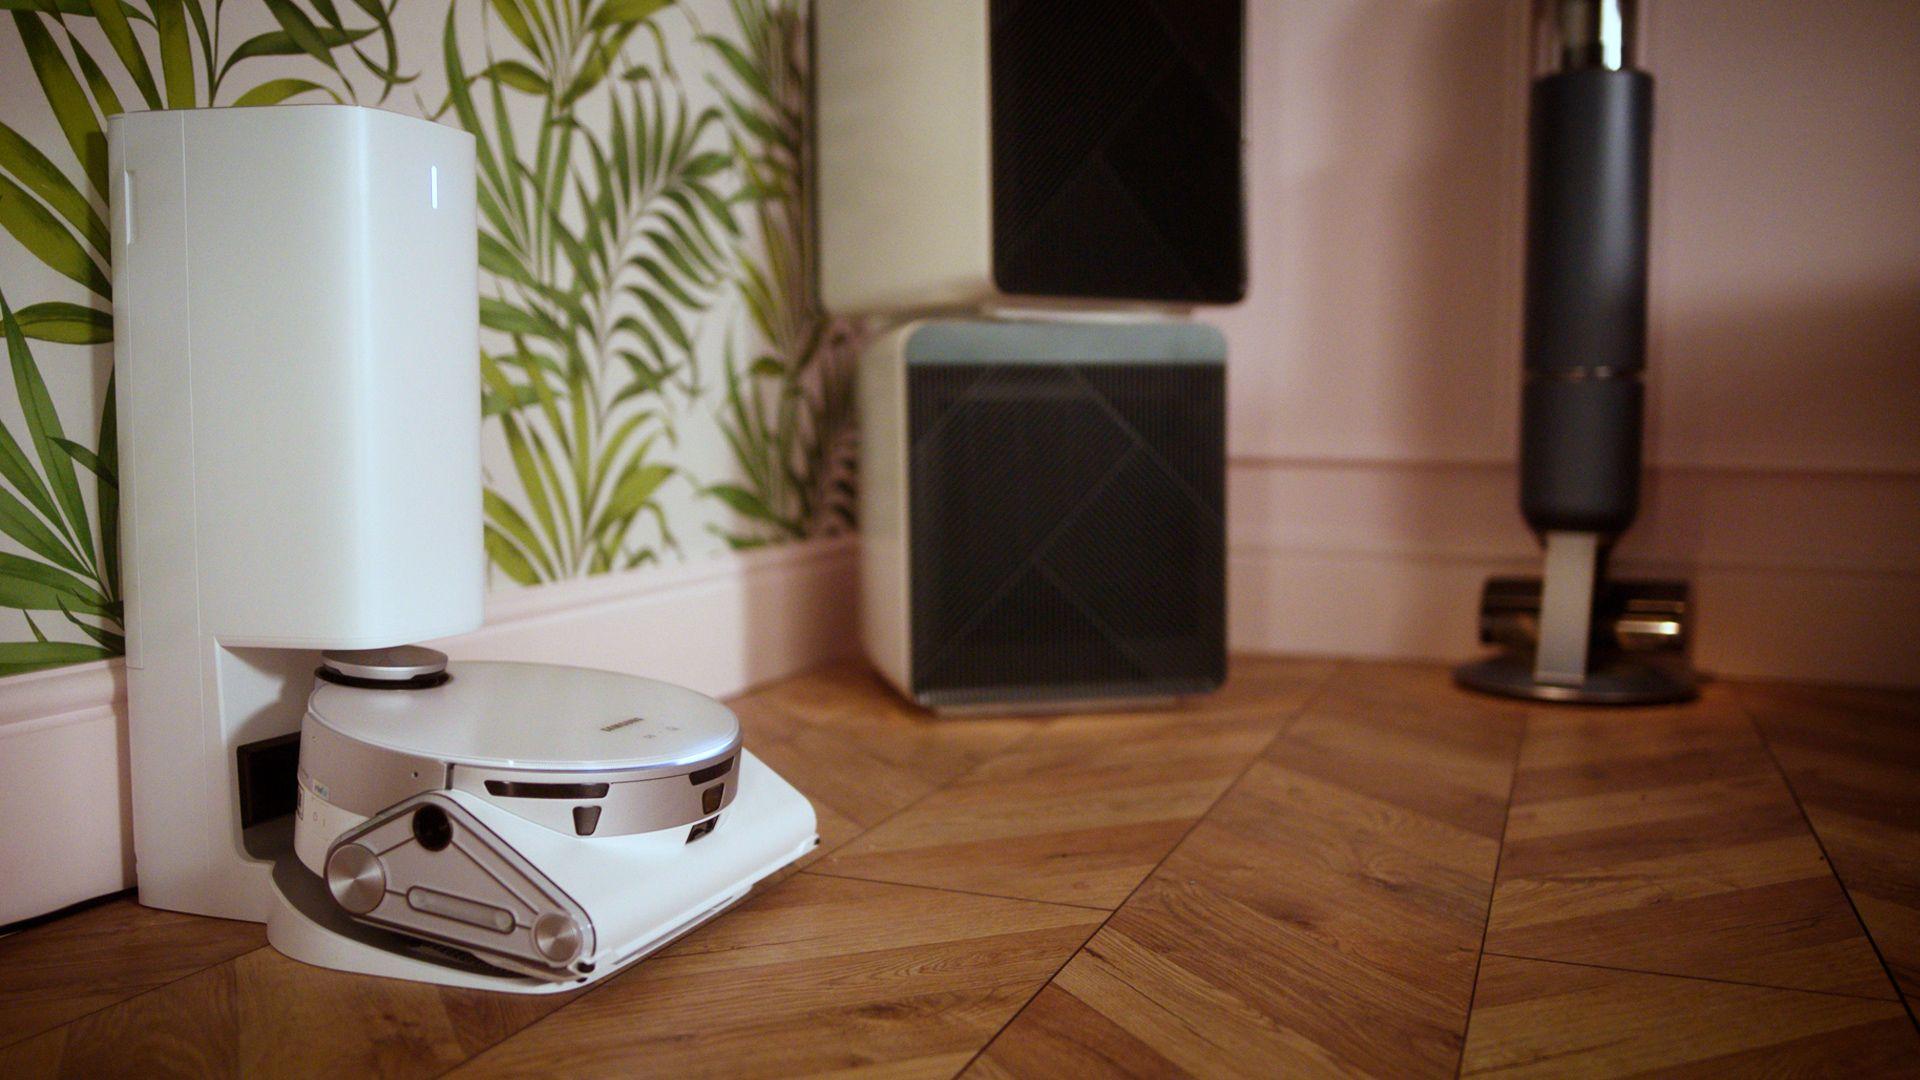 Living Room - Jet Bot AI+™ (1)